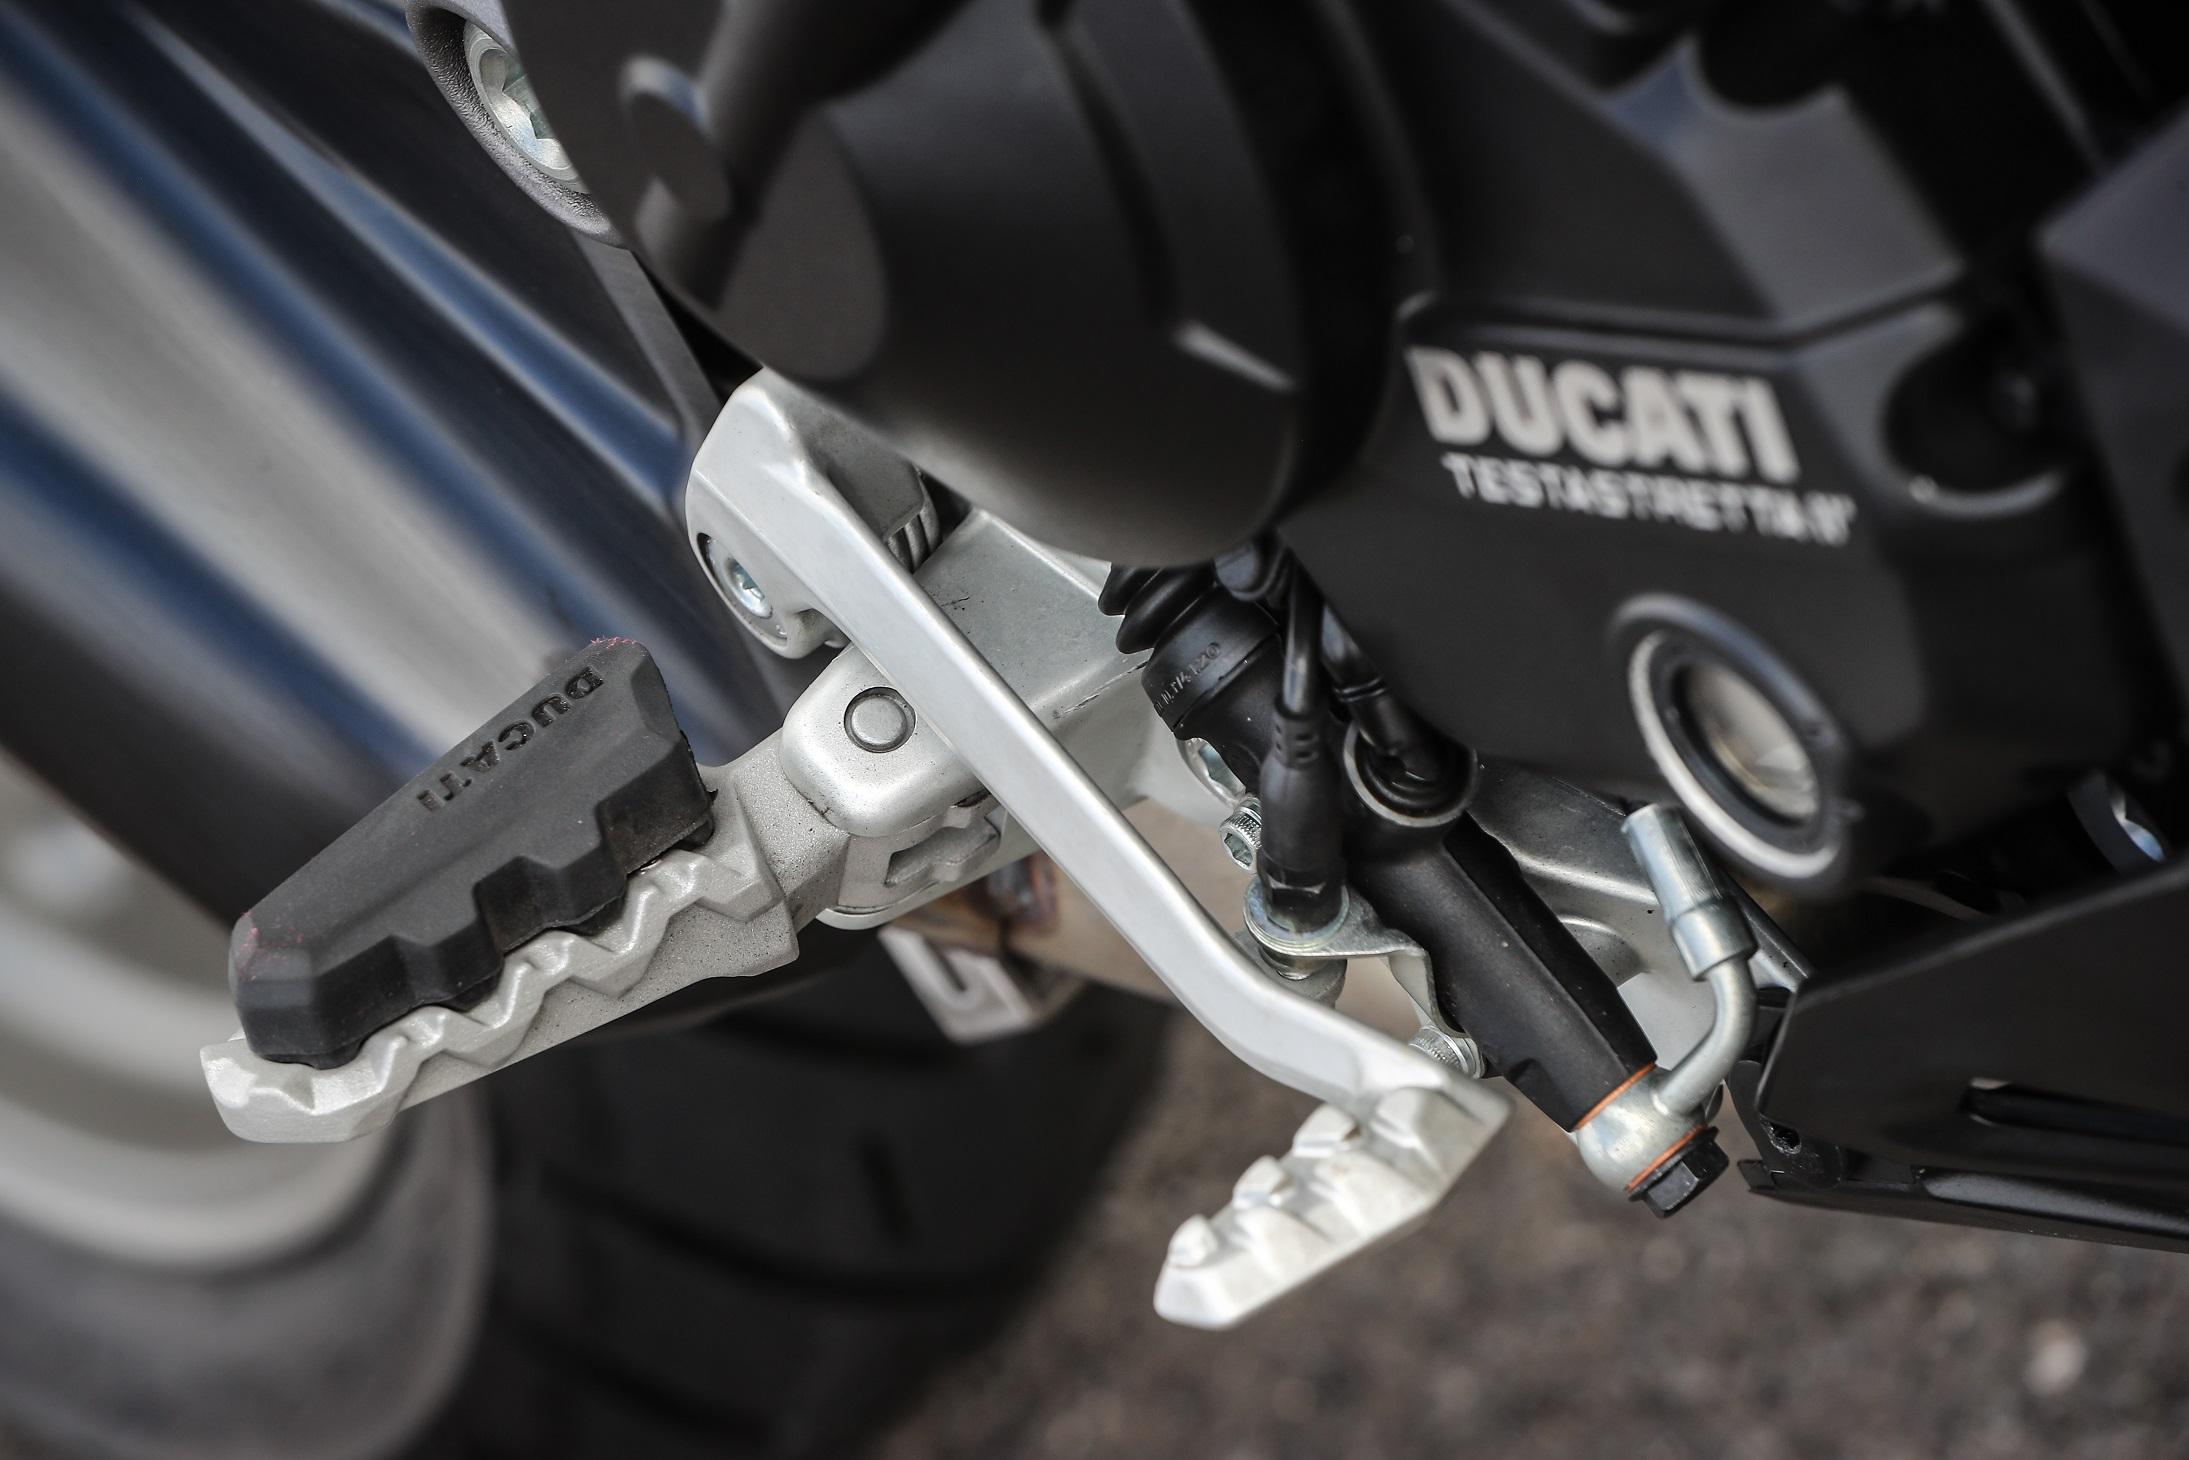 Ducati Multistrada 950 footrests